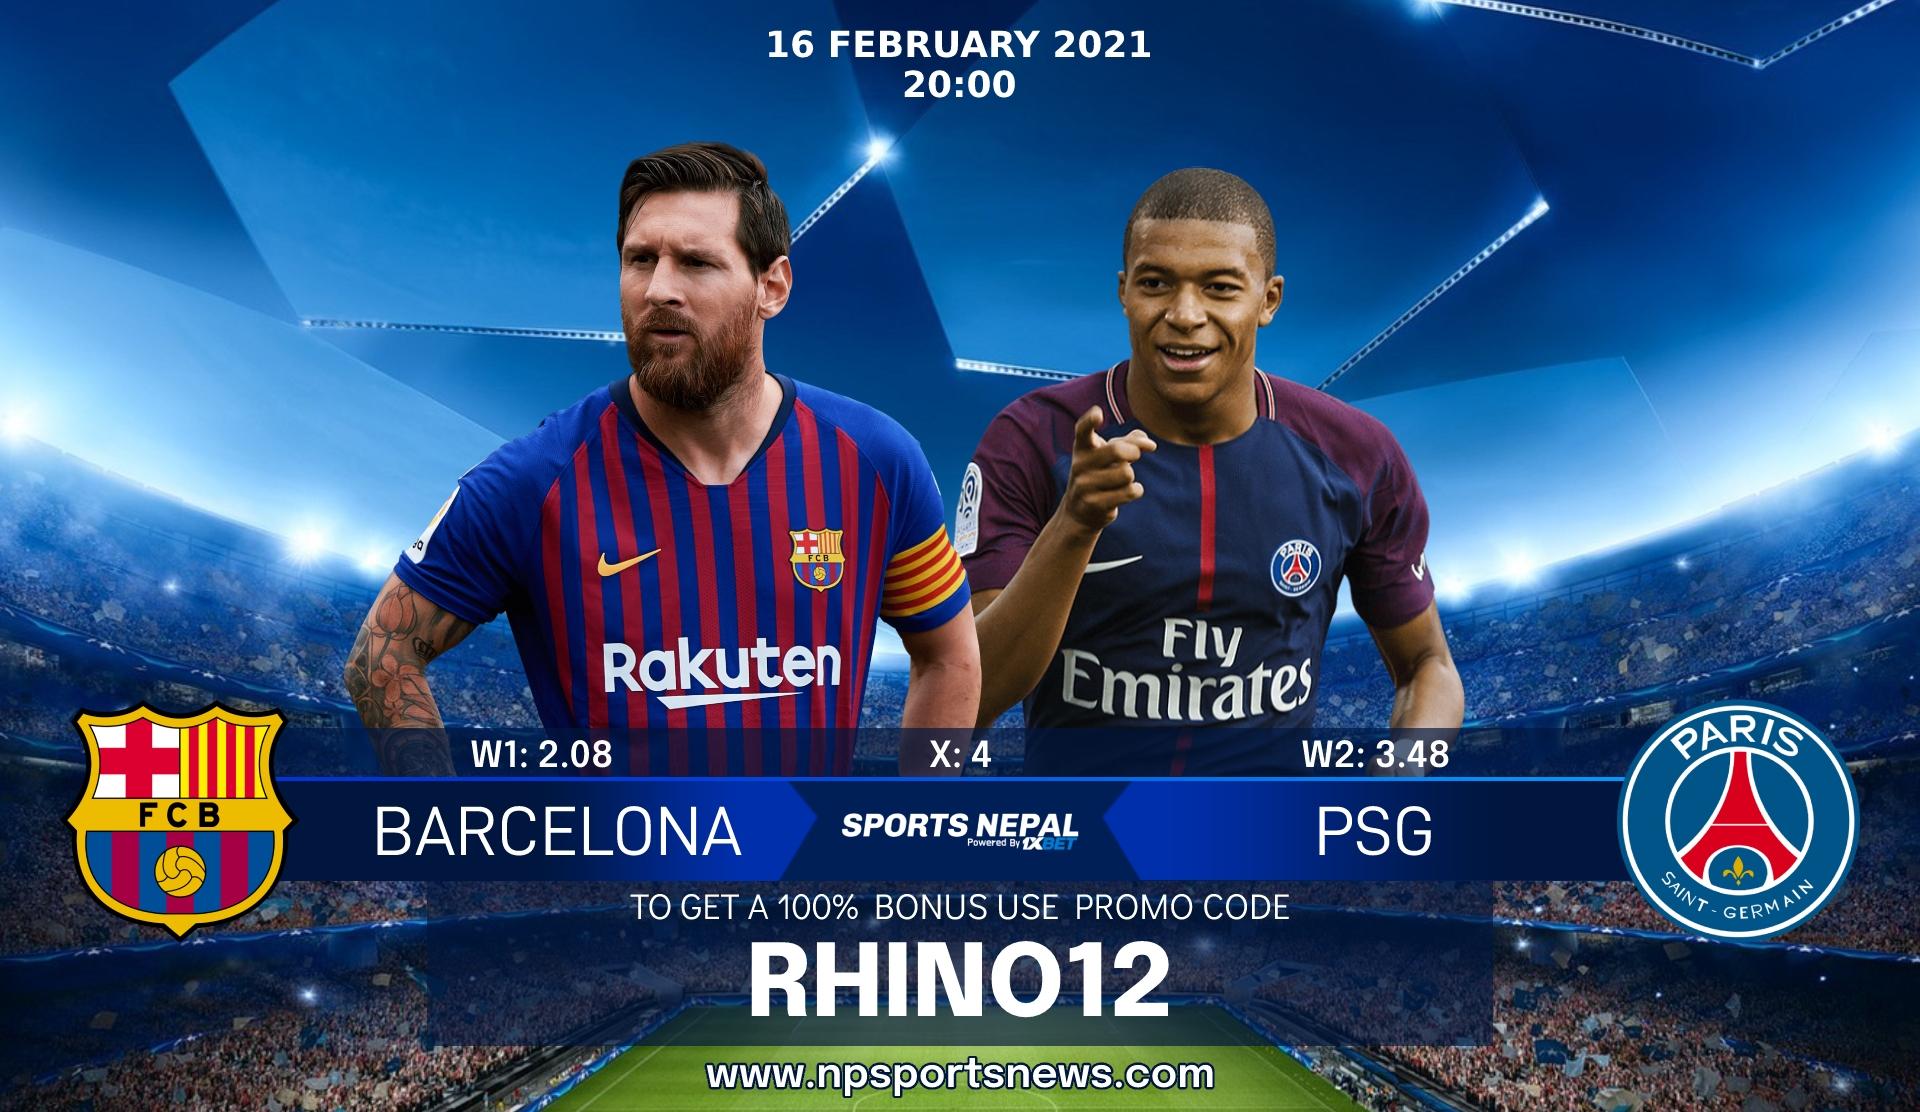 barcelona vs psg uefa champions league nepal sports